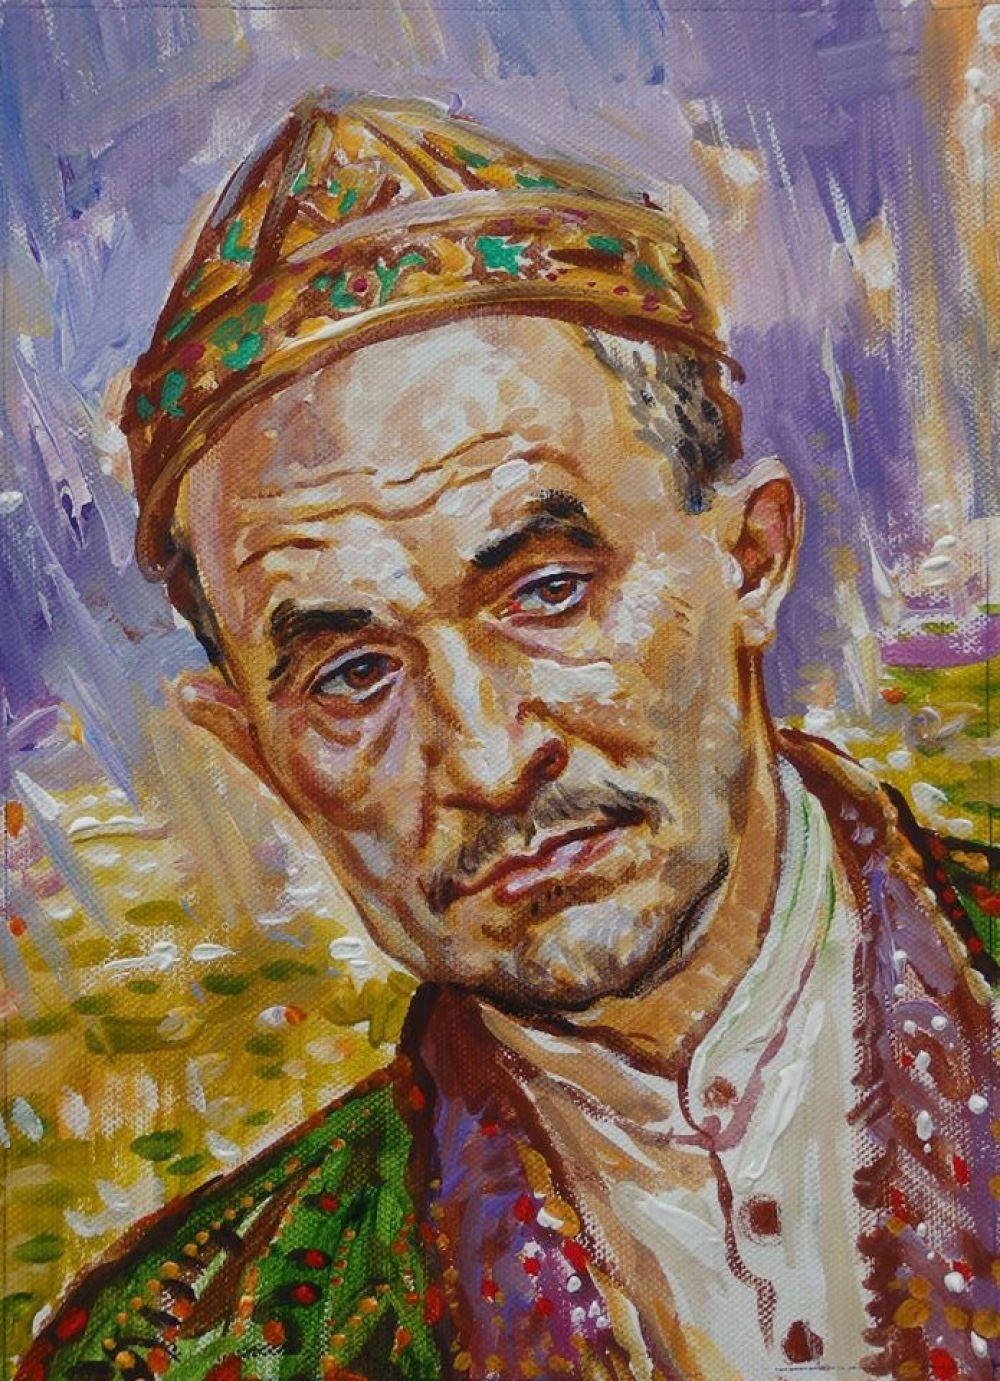 Бывший мэр Казани Камиль Исхаков (Хан Шах Али)